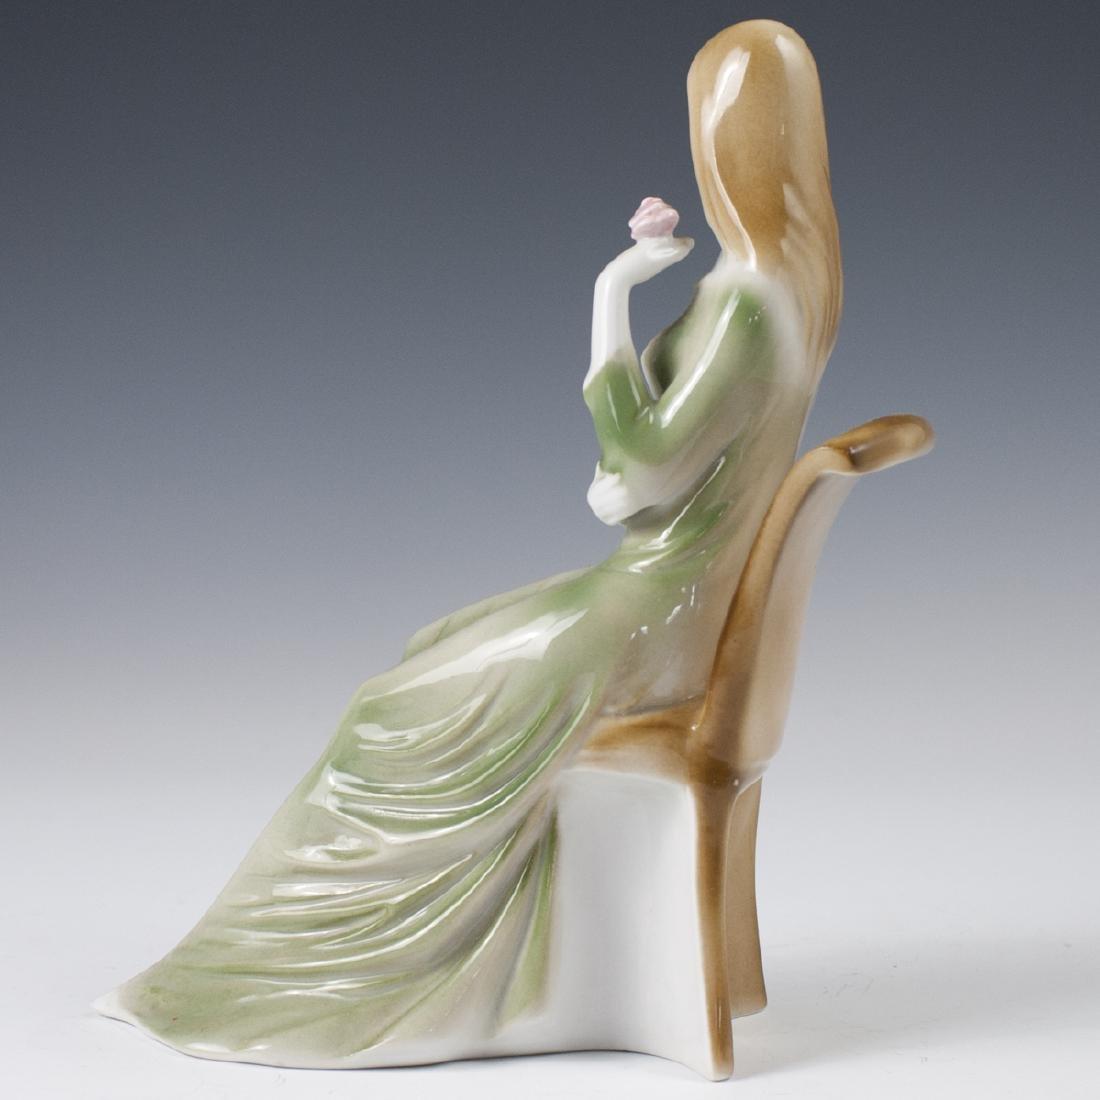 Zsolnay Porcelain Figurine - 4